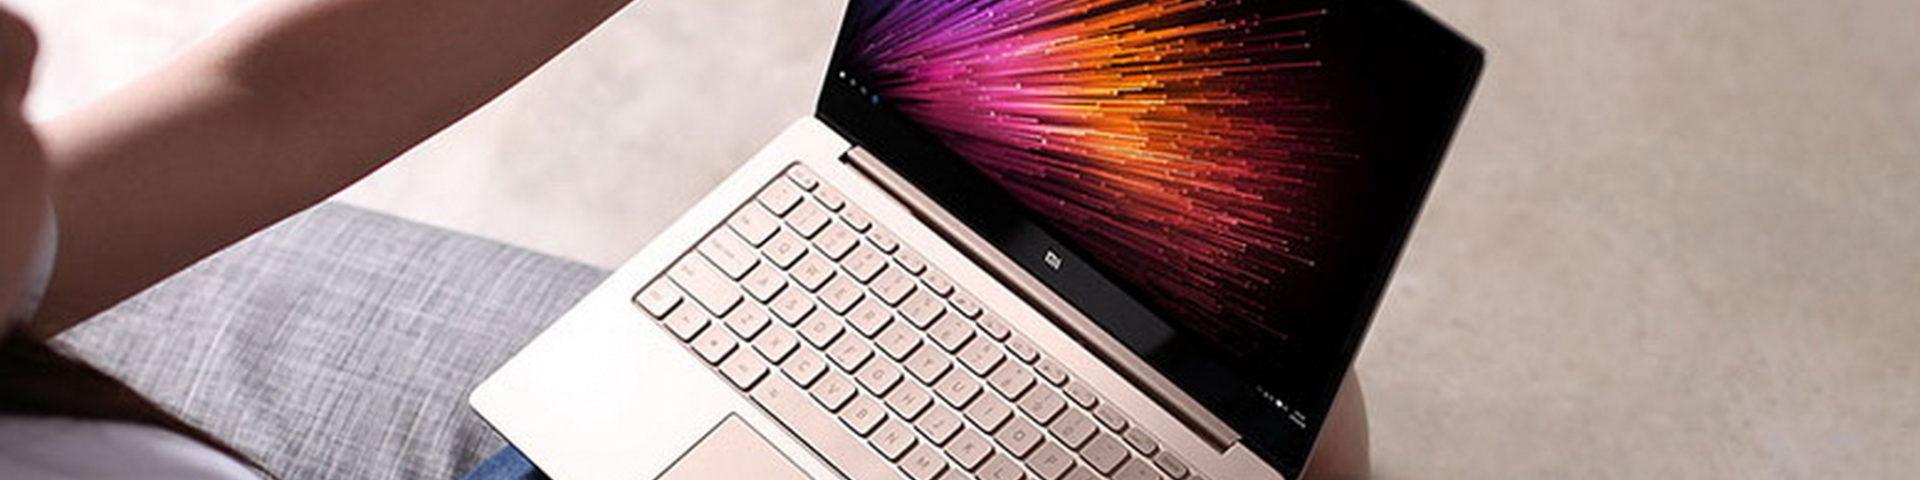 Ноутбук Xiaomi Mi Notebook Air 13